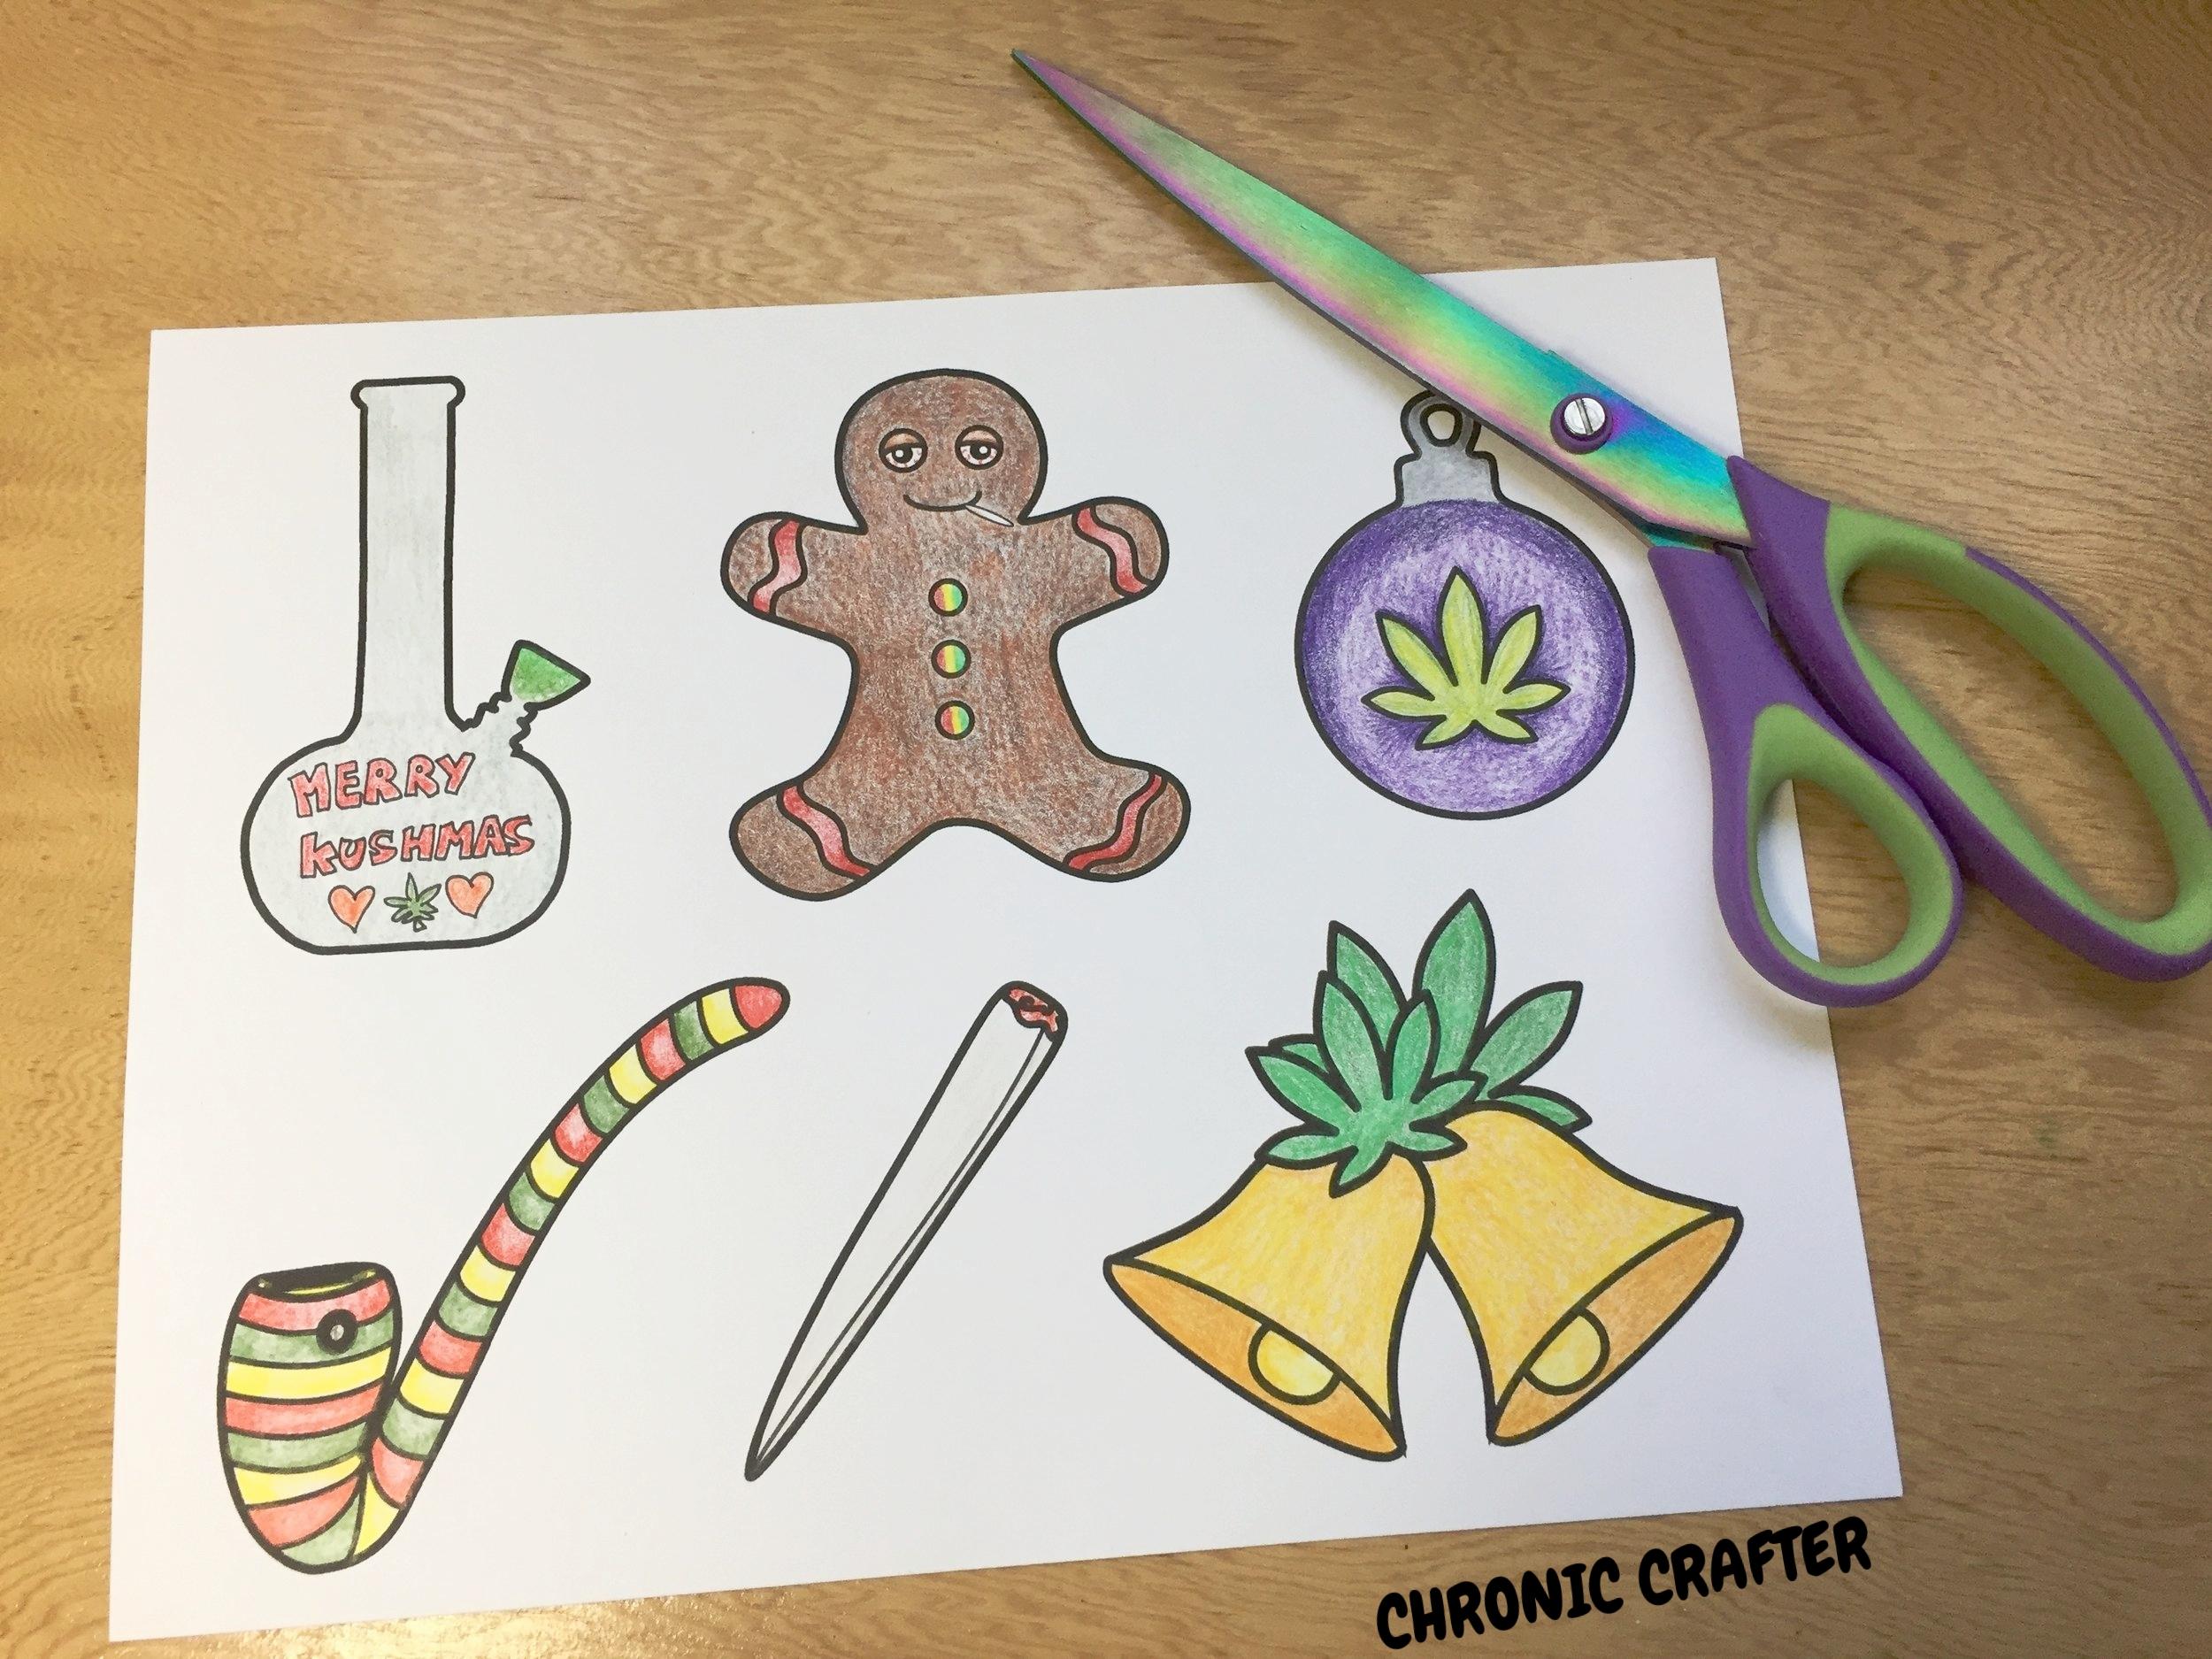 DIY Marijuana Themed Christmas (Kushmas) Ornaments Tutorial